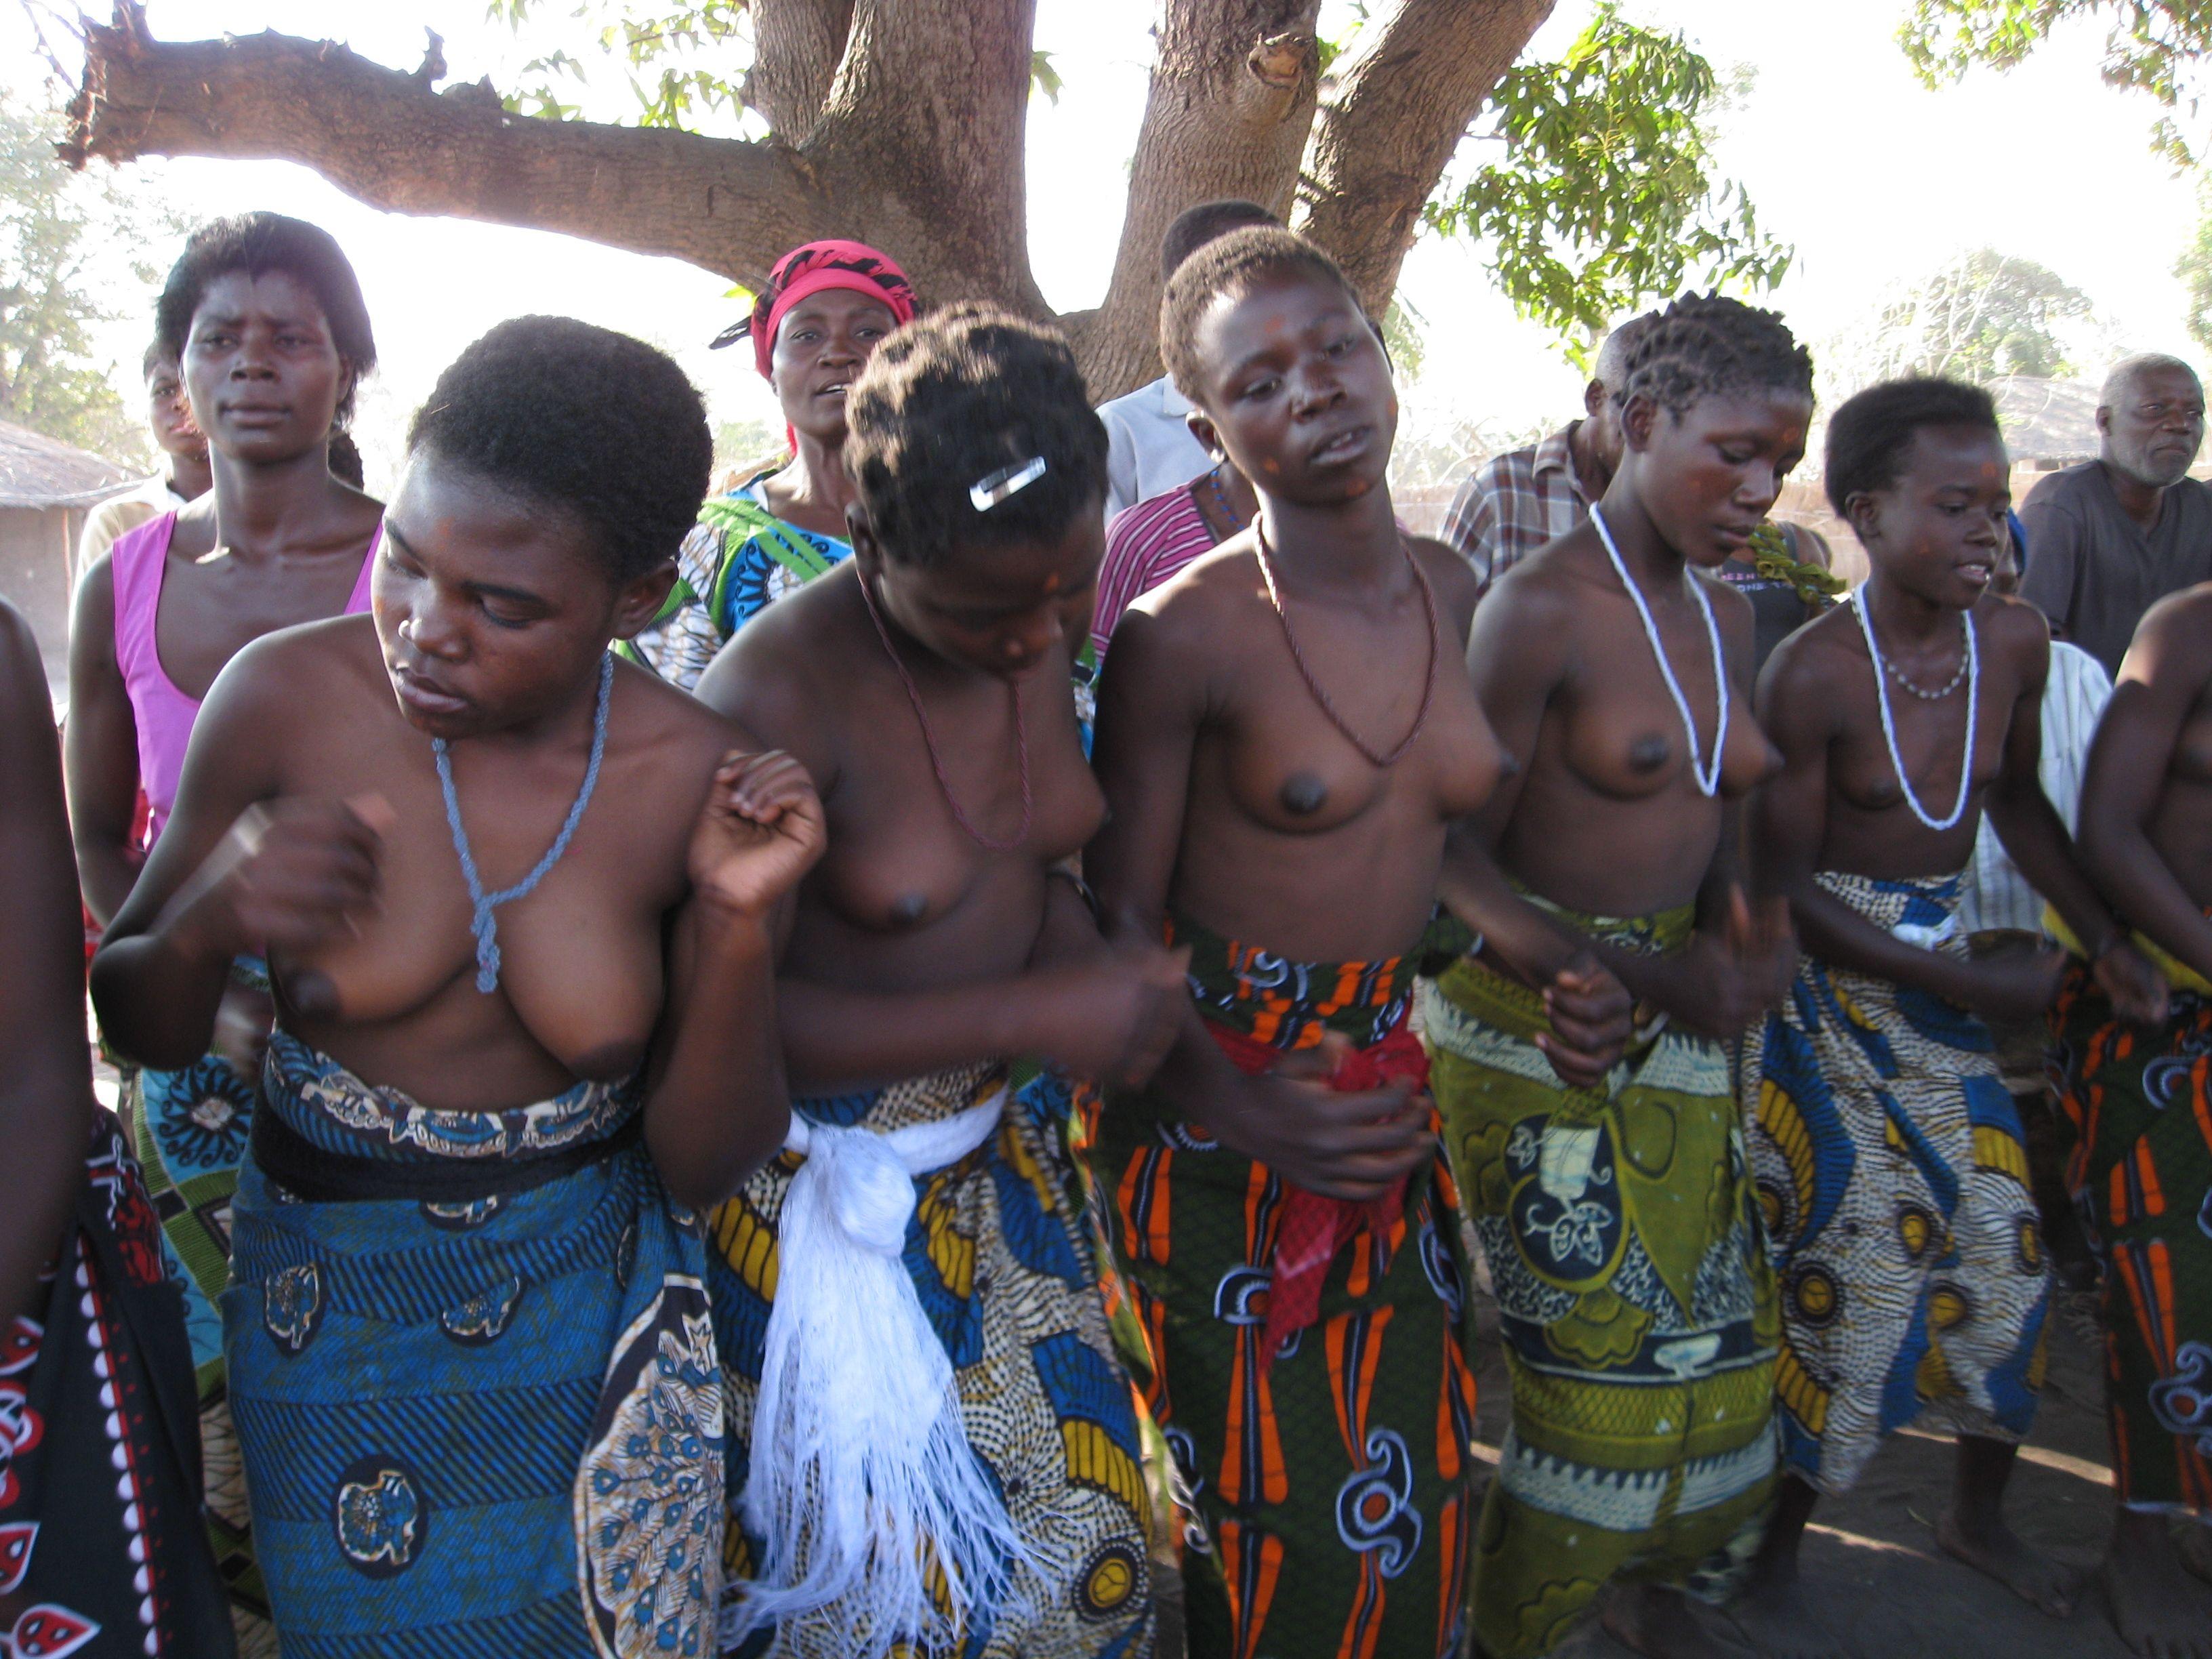 Masai tribe porn videos exploited pics